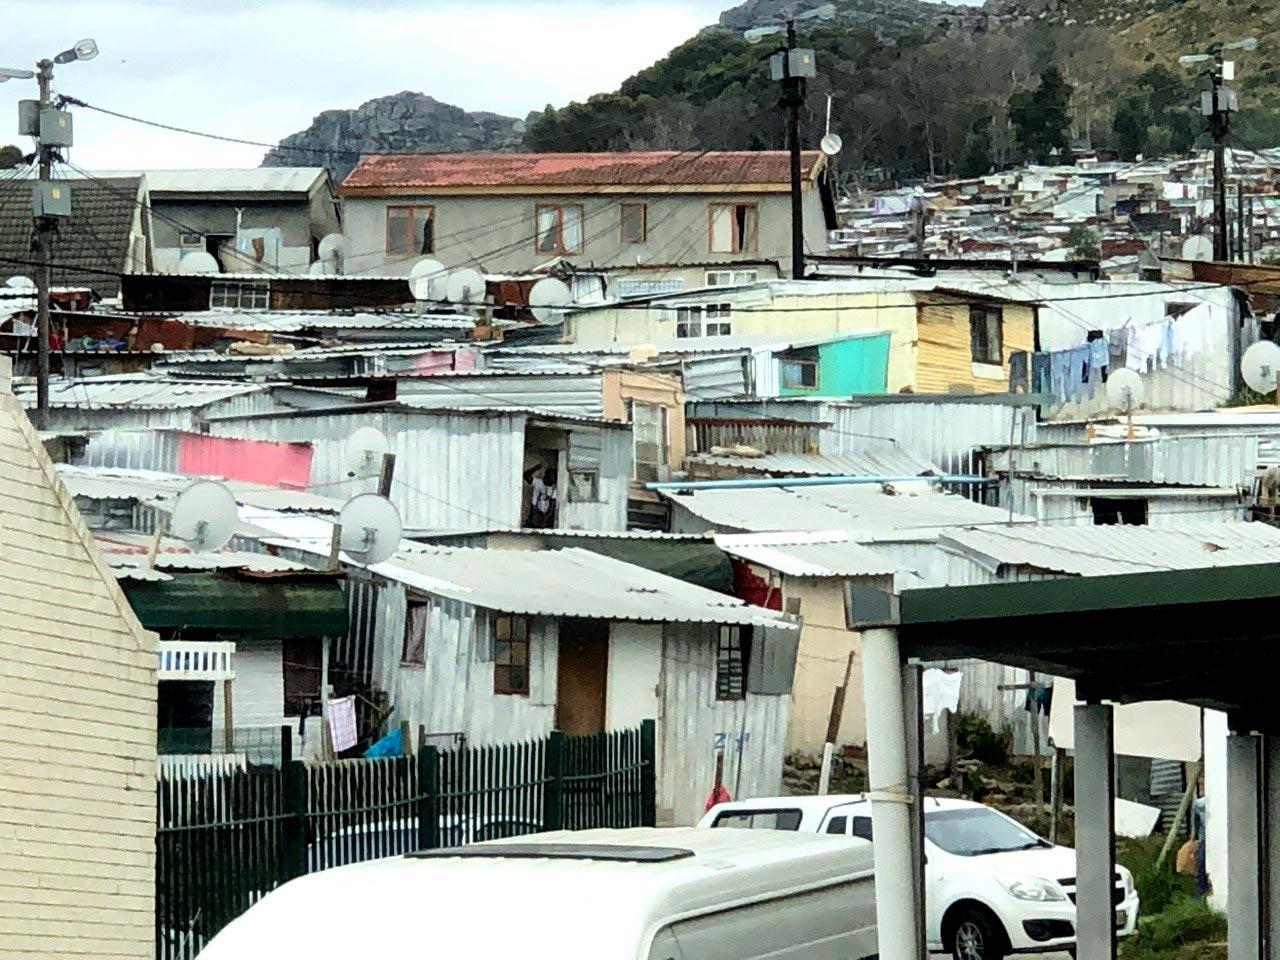 Townshion in Kapstadt mit hoher Kriminalität